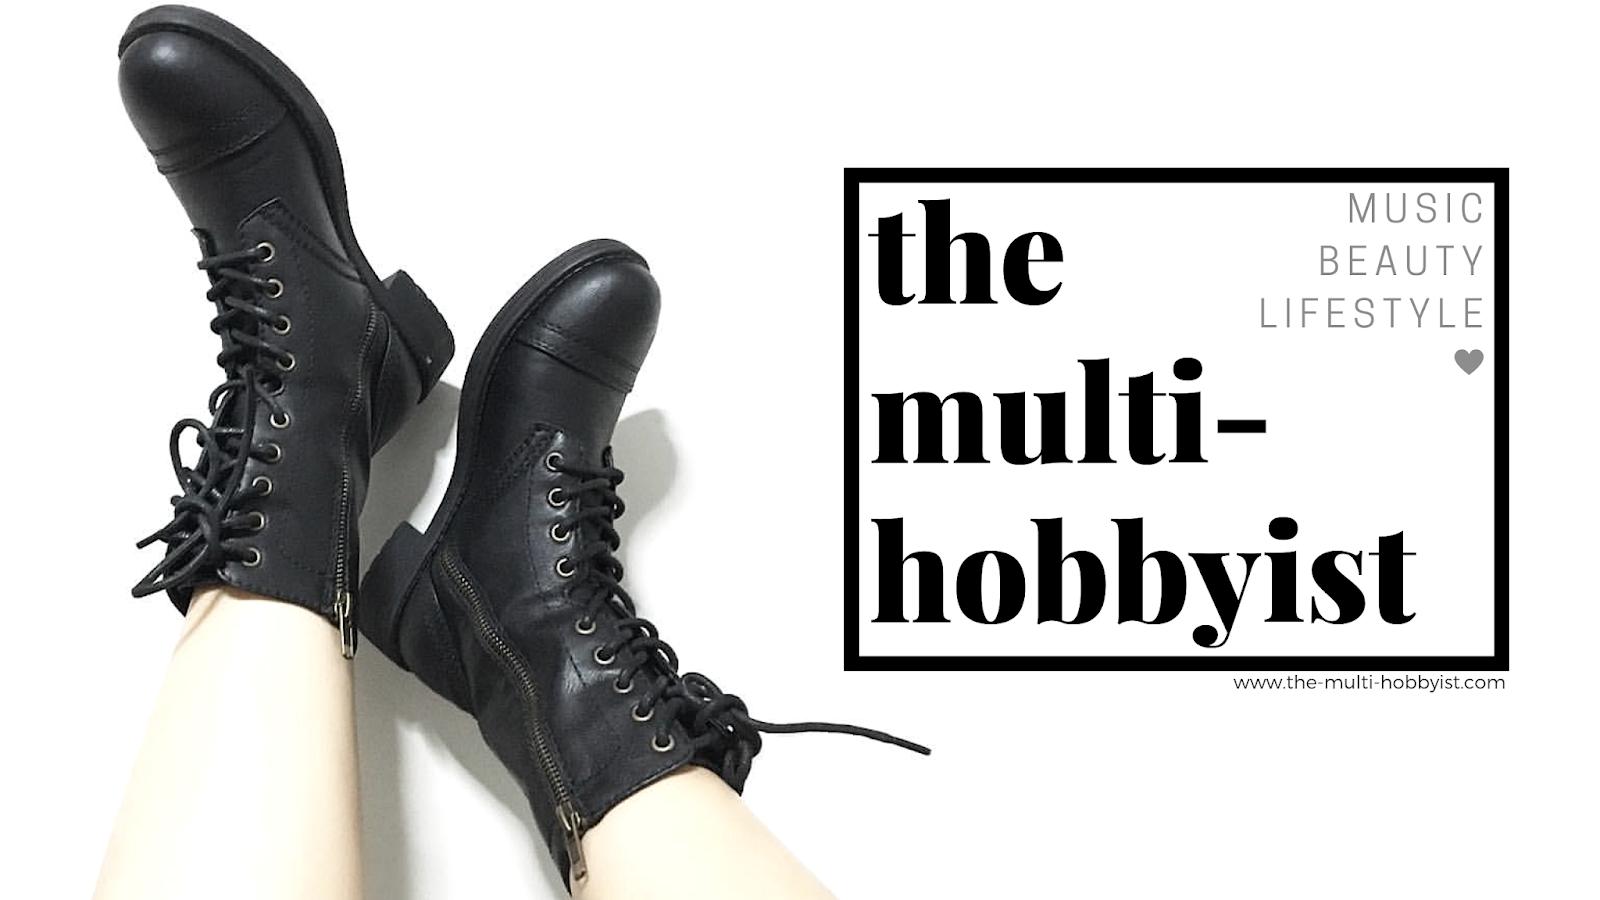 www.the-multi-hobbyist.com